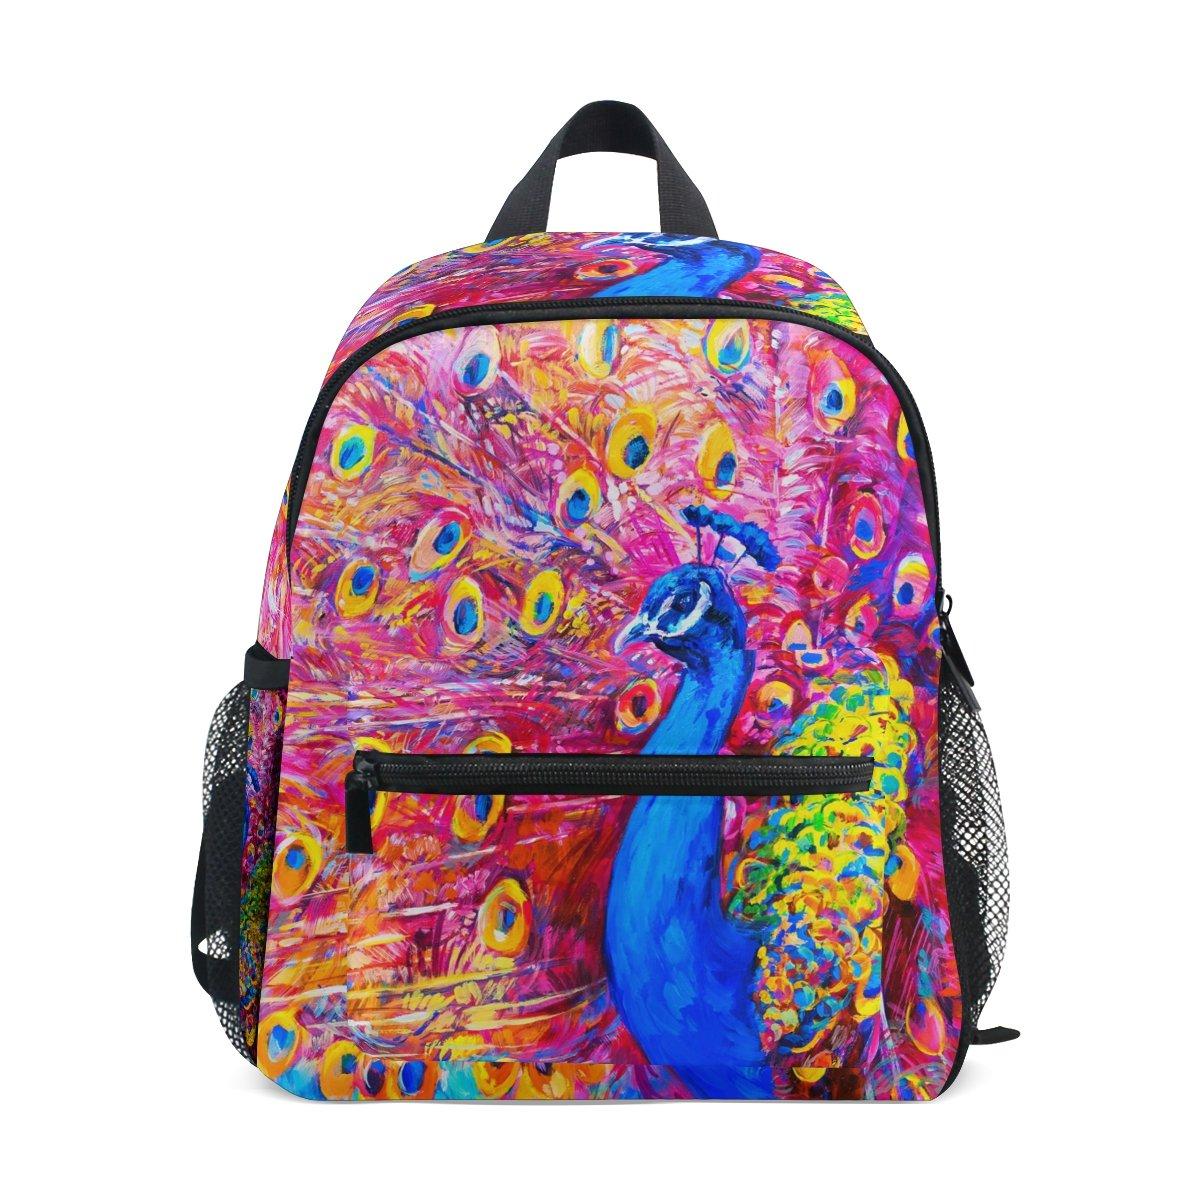 Colourlife Kidブックバッグ水彩Peacock PaintingバックパックスクールBag for Girl Boy B07DNBMCT7